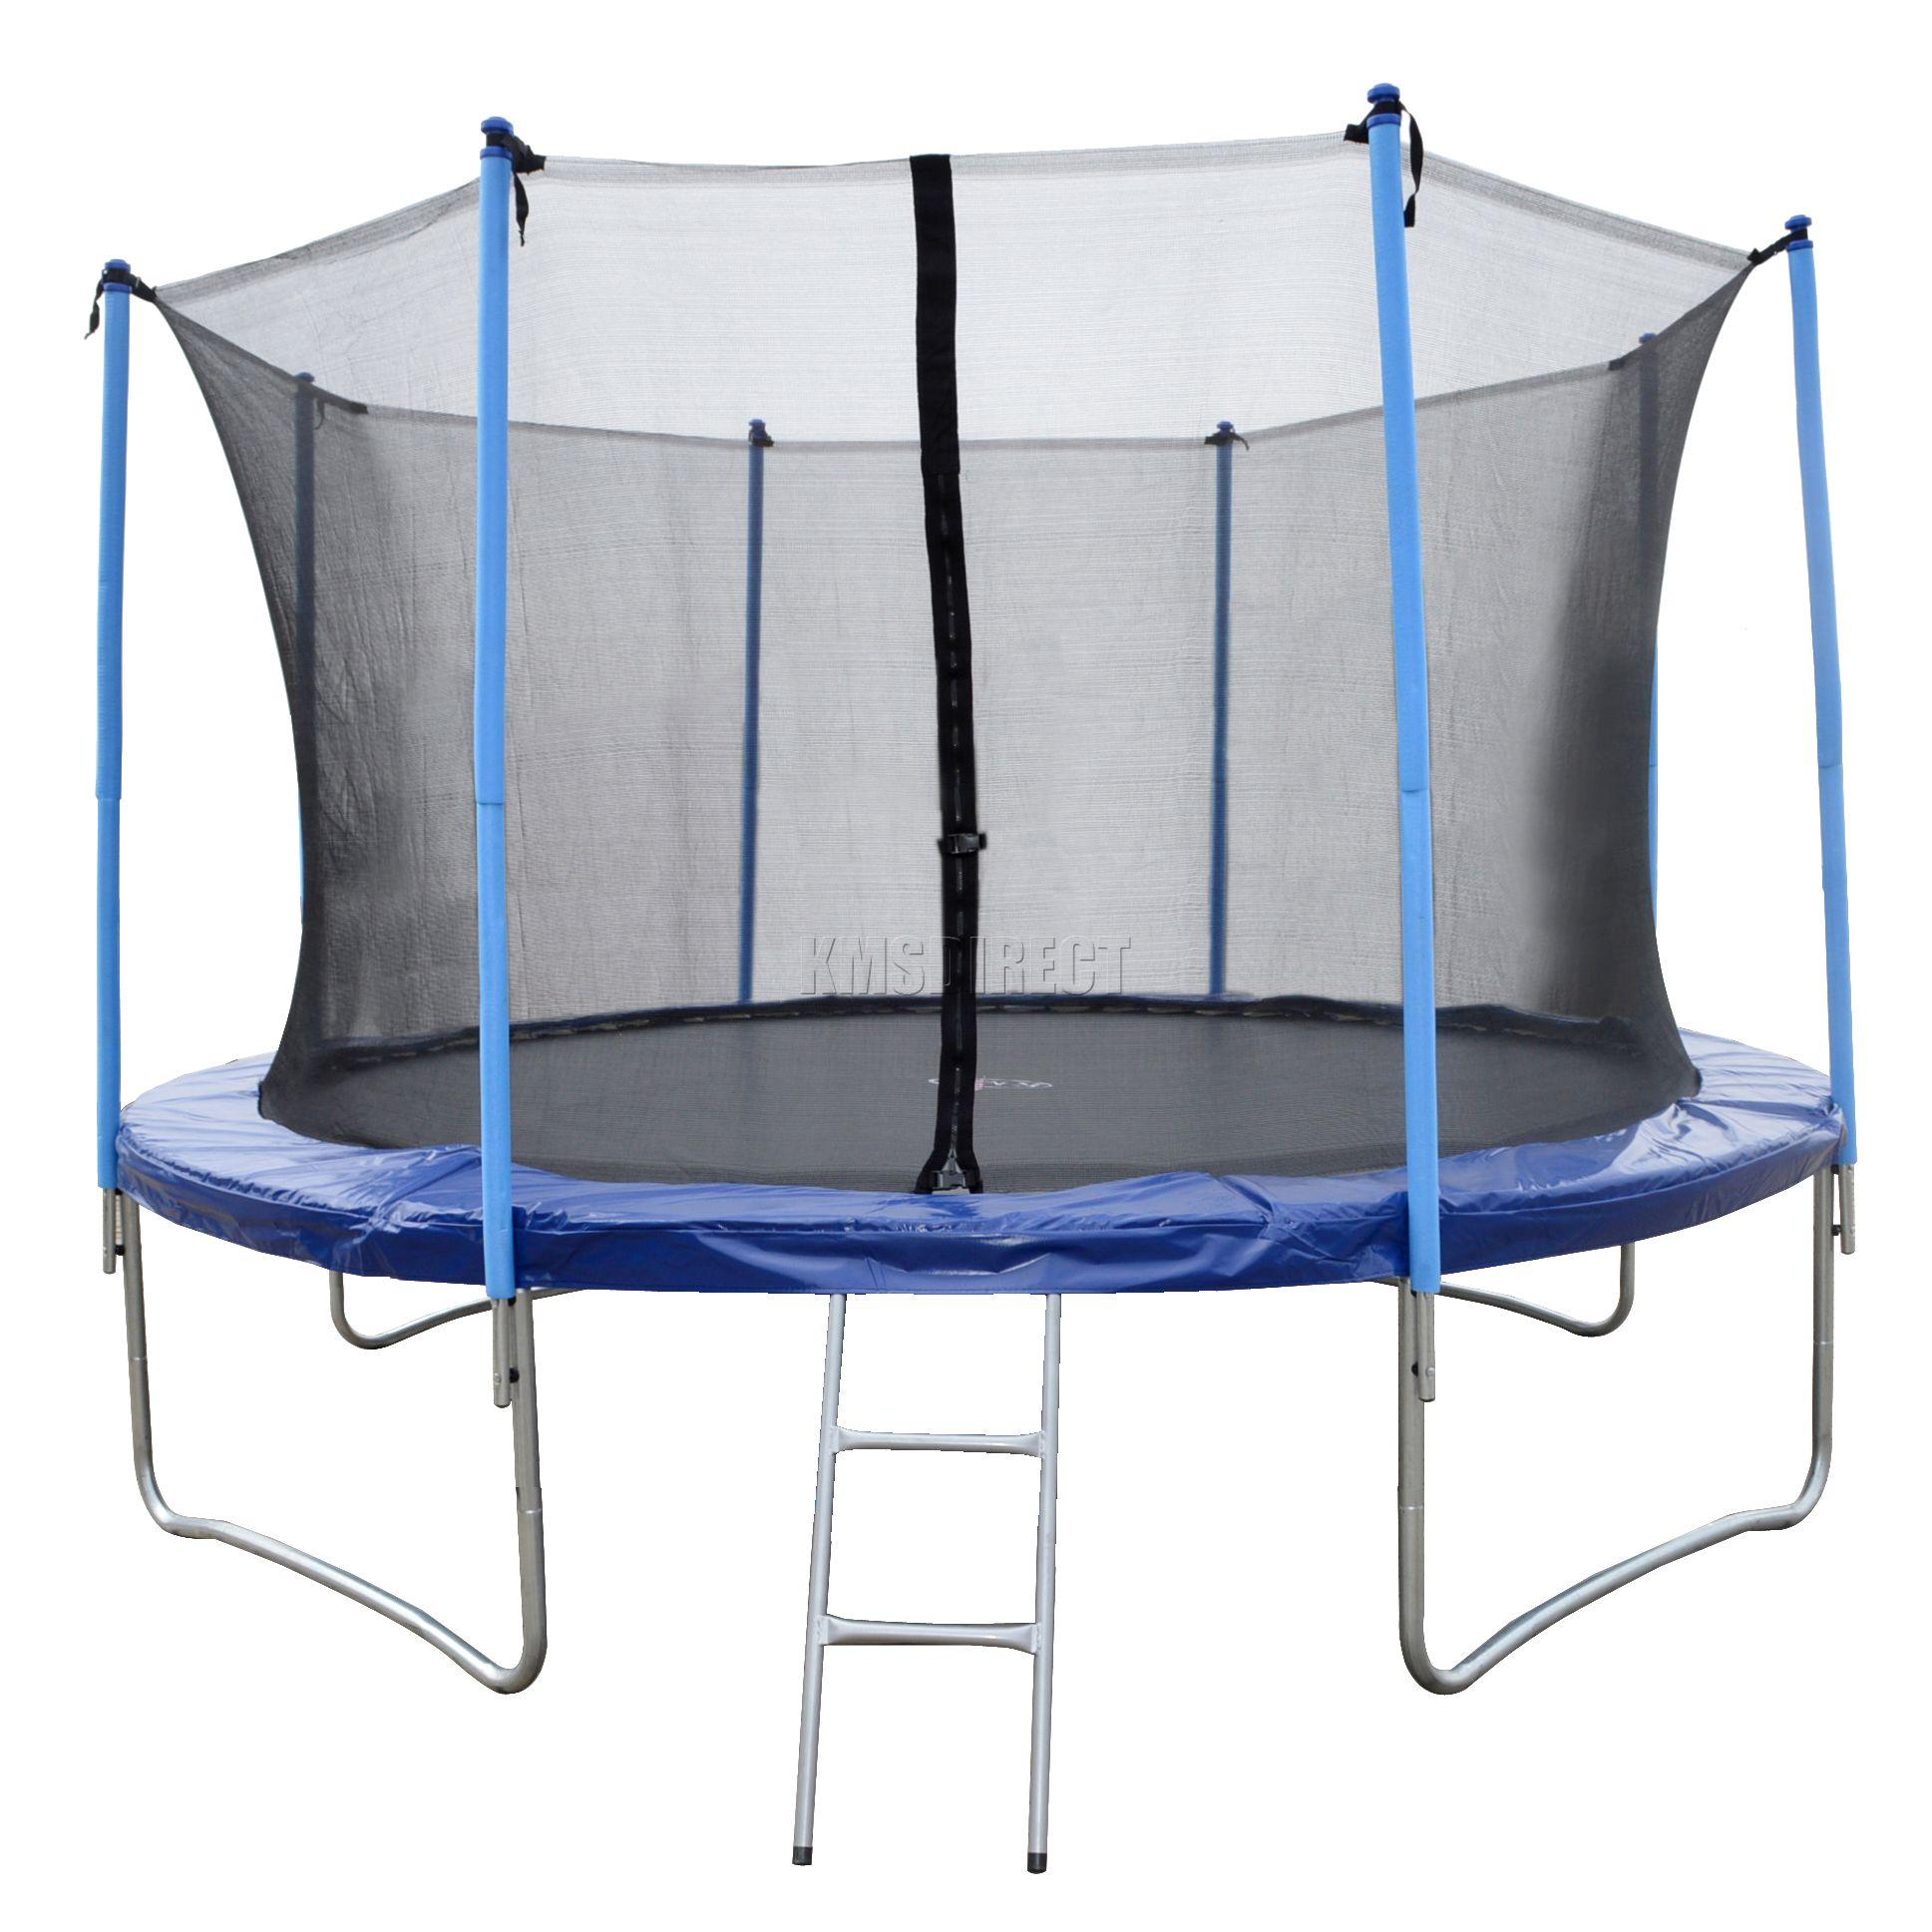 8FT 10FT 12FT 14FT 16FT Trampoline With Safety Enclosure